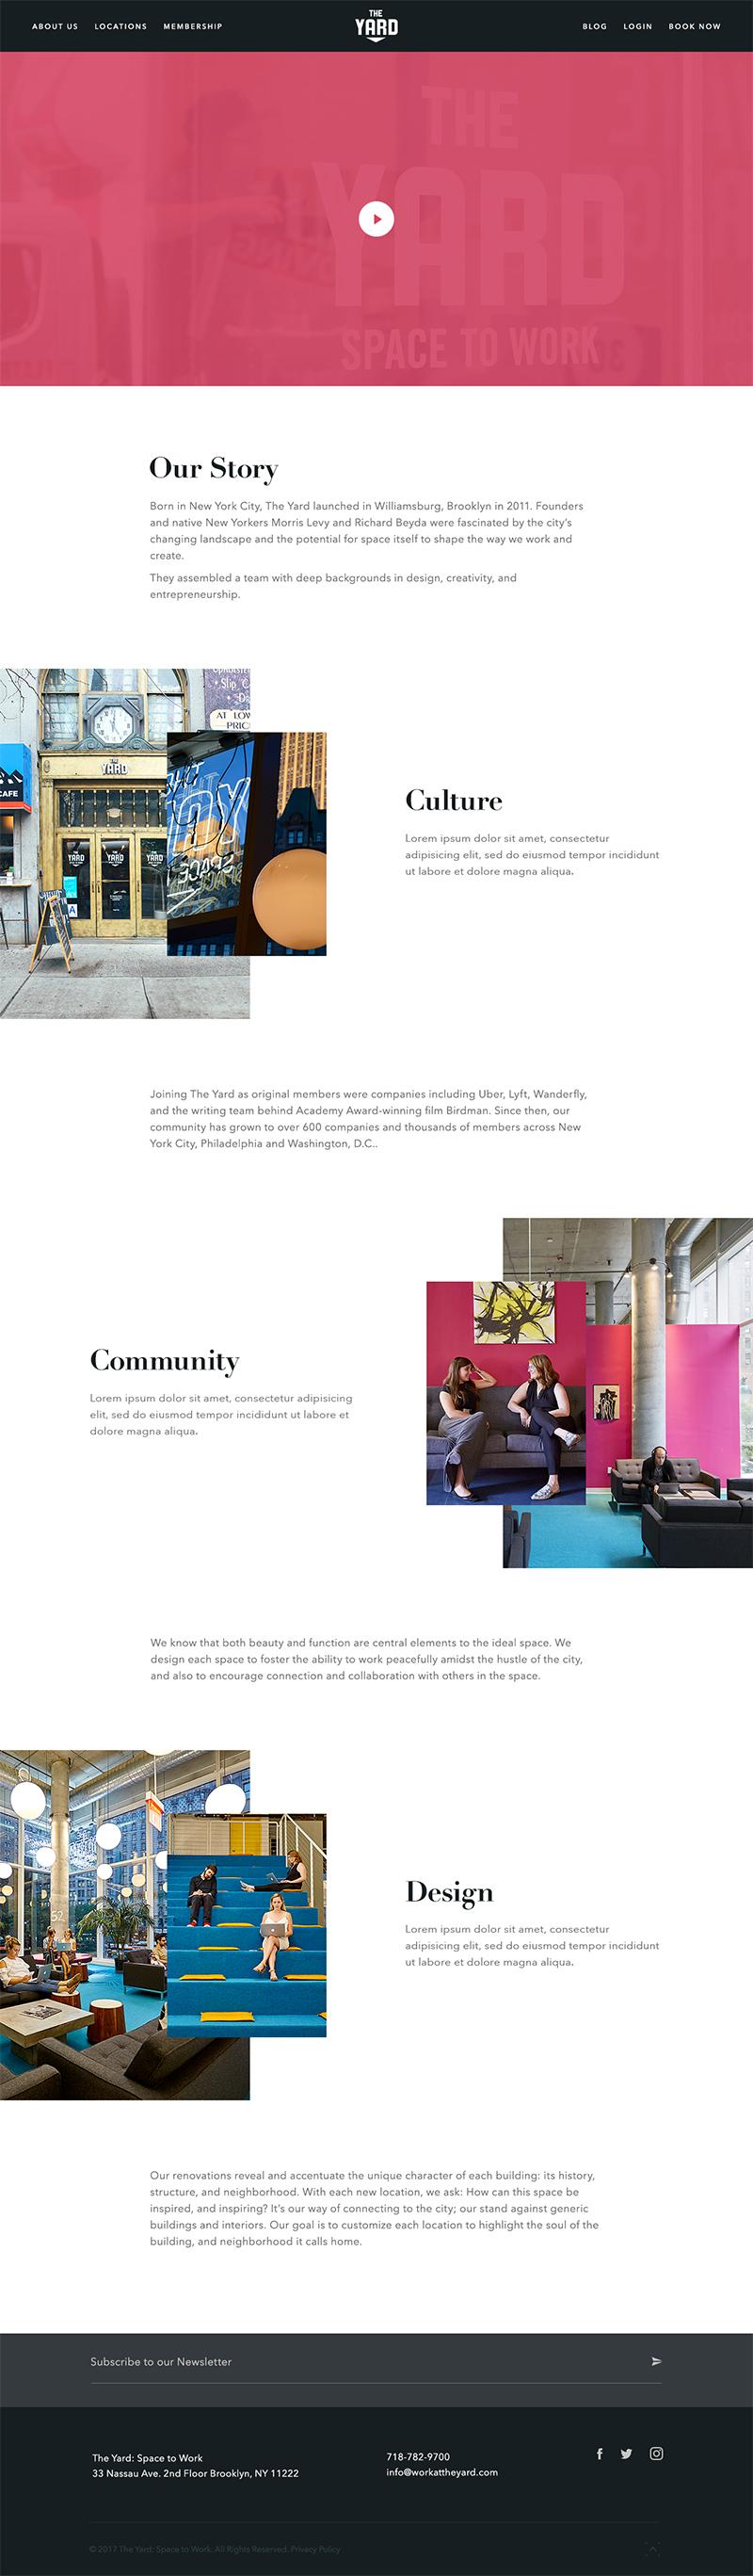 The Yard Page Screenshot